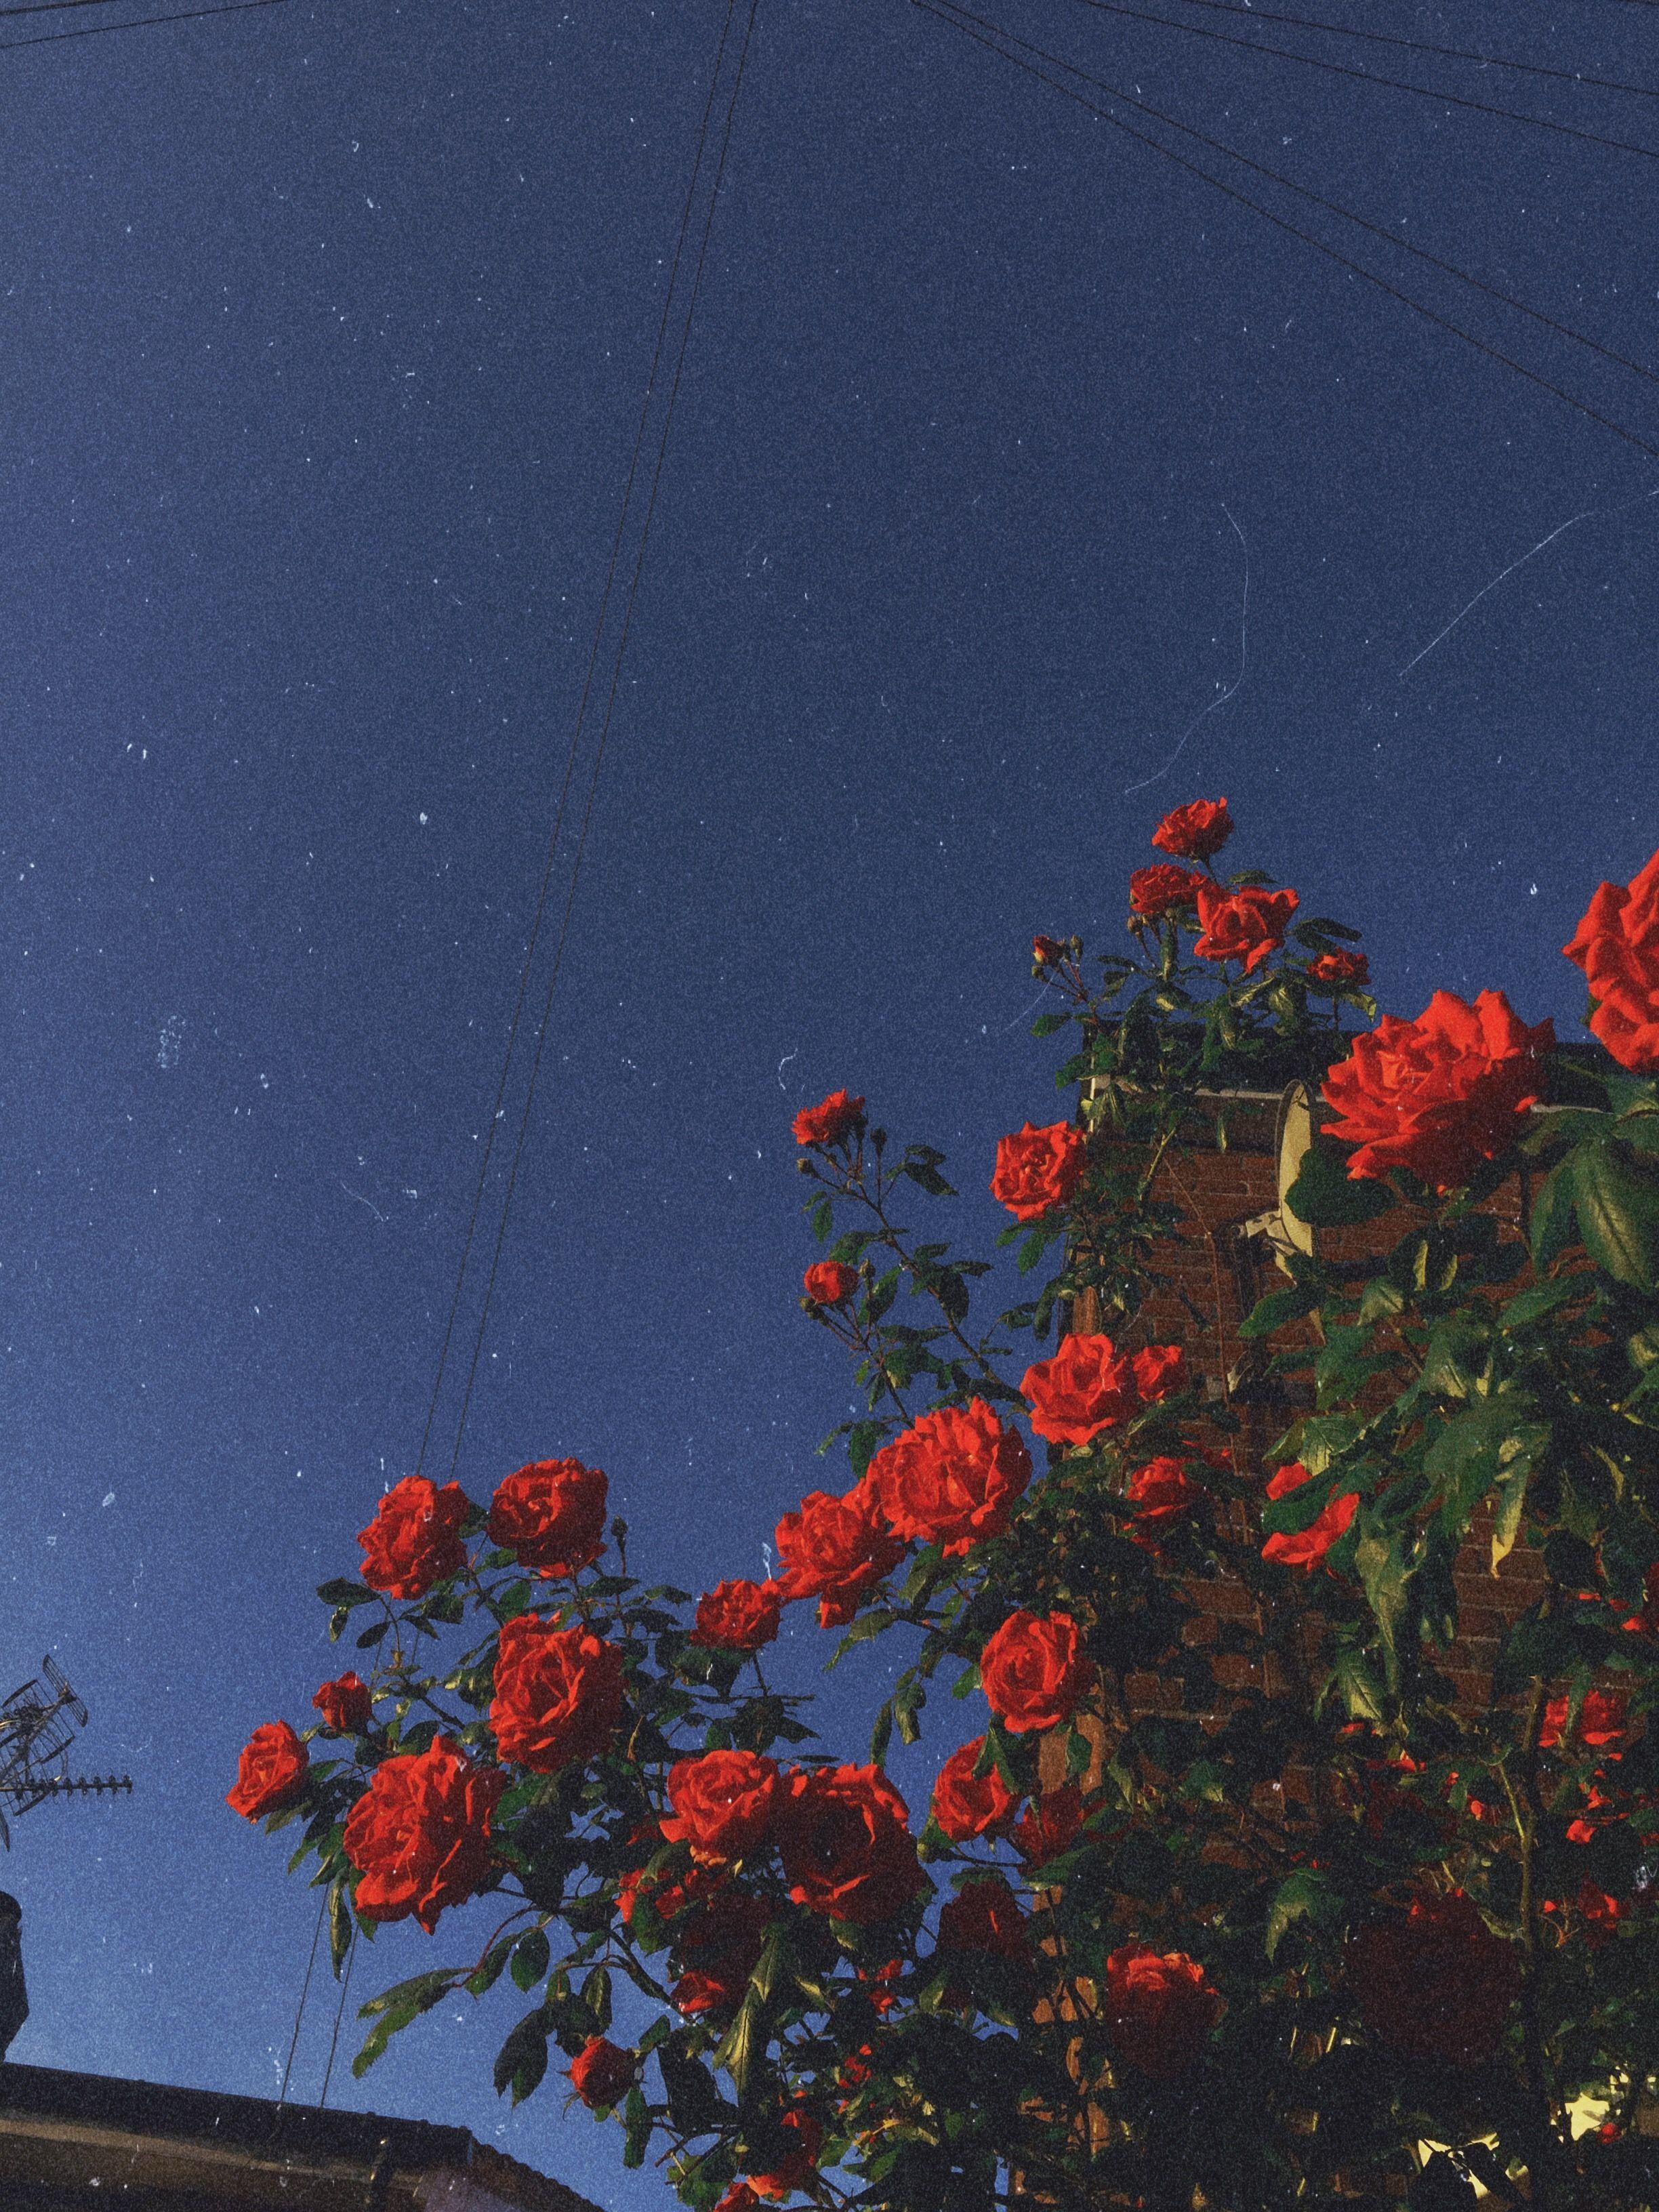 red roses flowers redaesthetic aesthetic redroses vintage 2448x3264